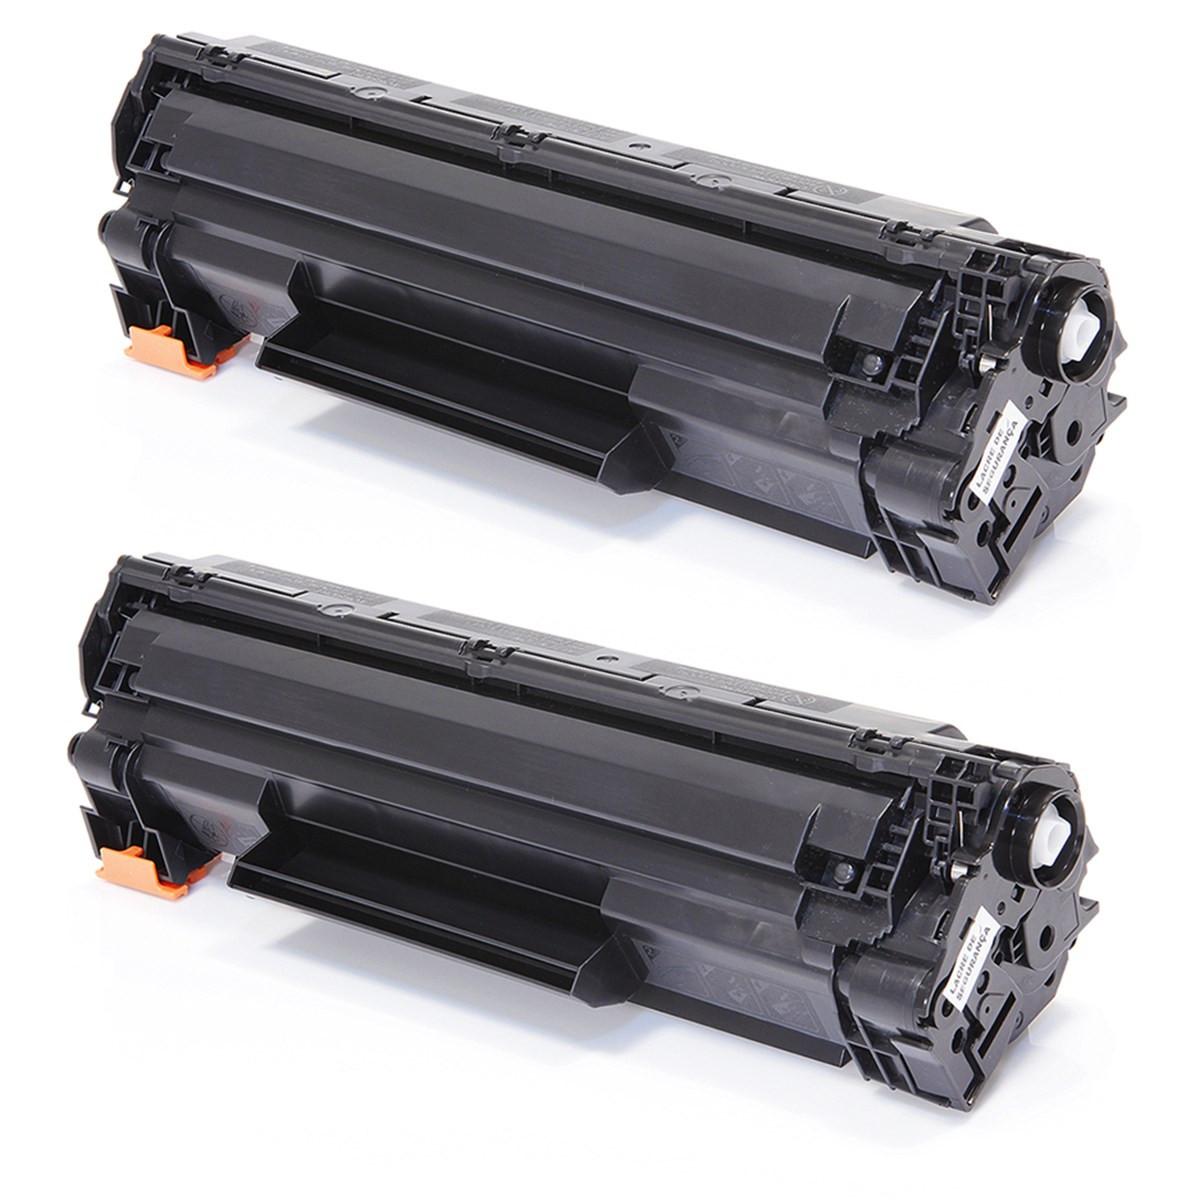 Kit 2 Toner Compatível com HP CB436A CB436AB | P1505 P1505N M1120 M1522 M1522N M1522NF Premium 1.8k